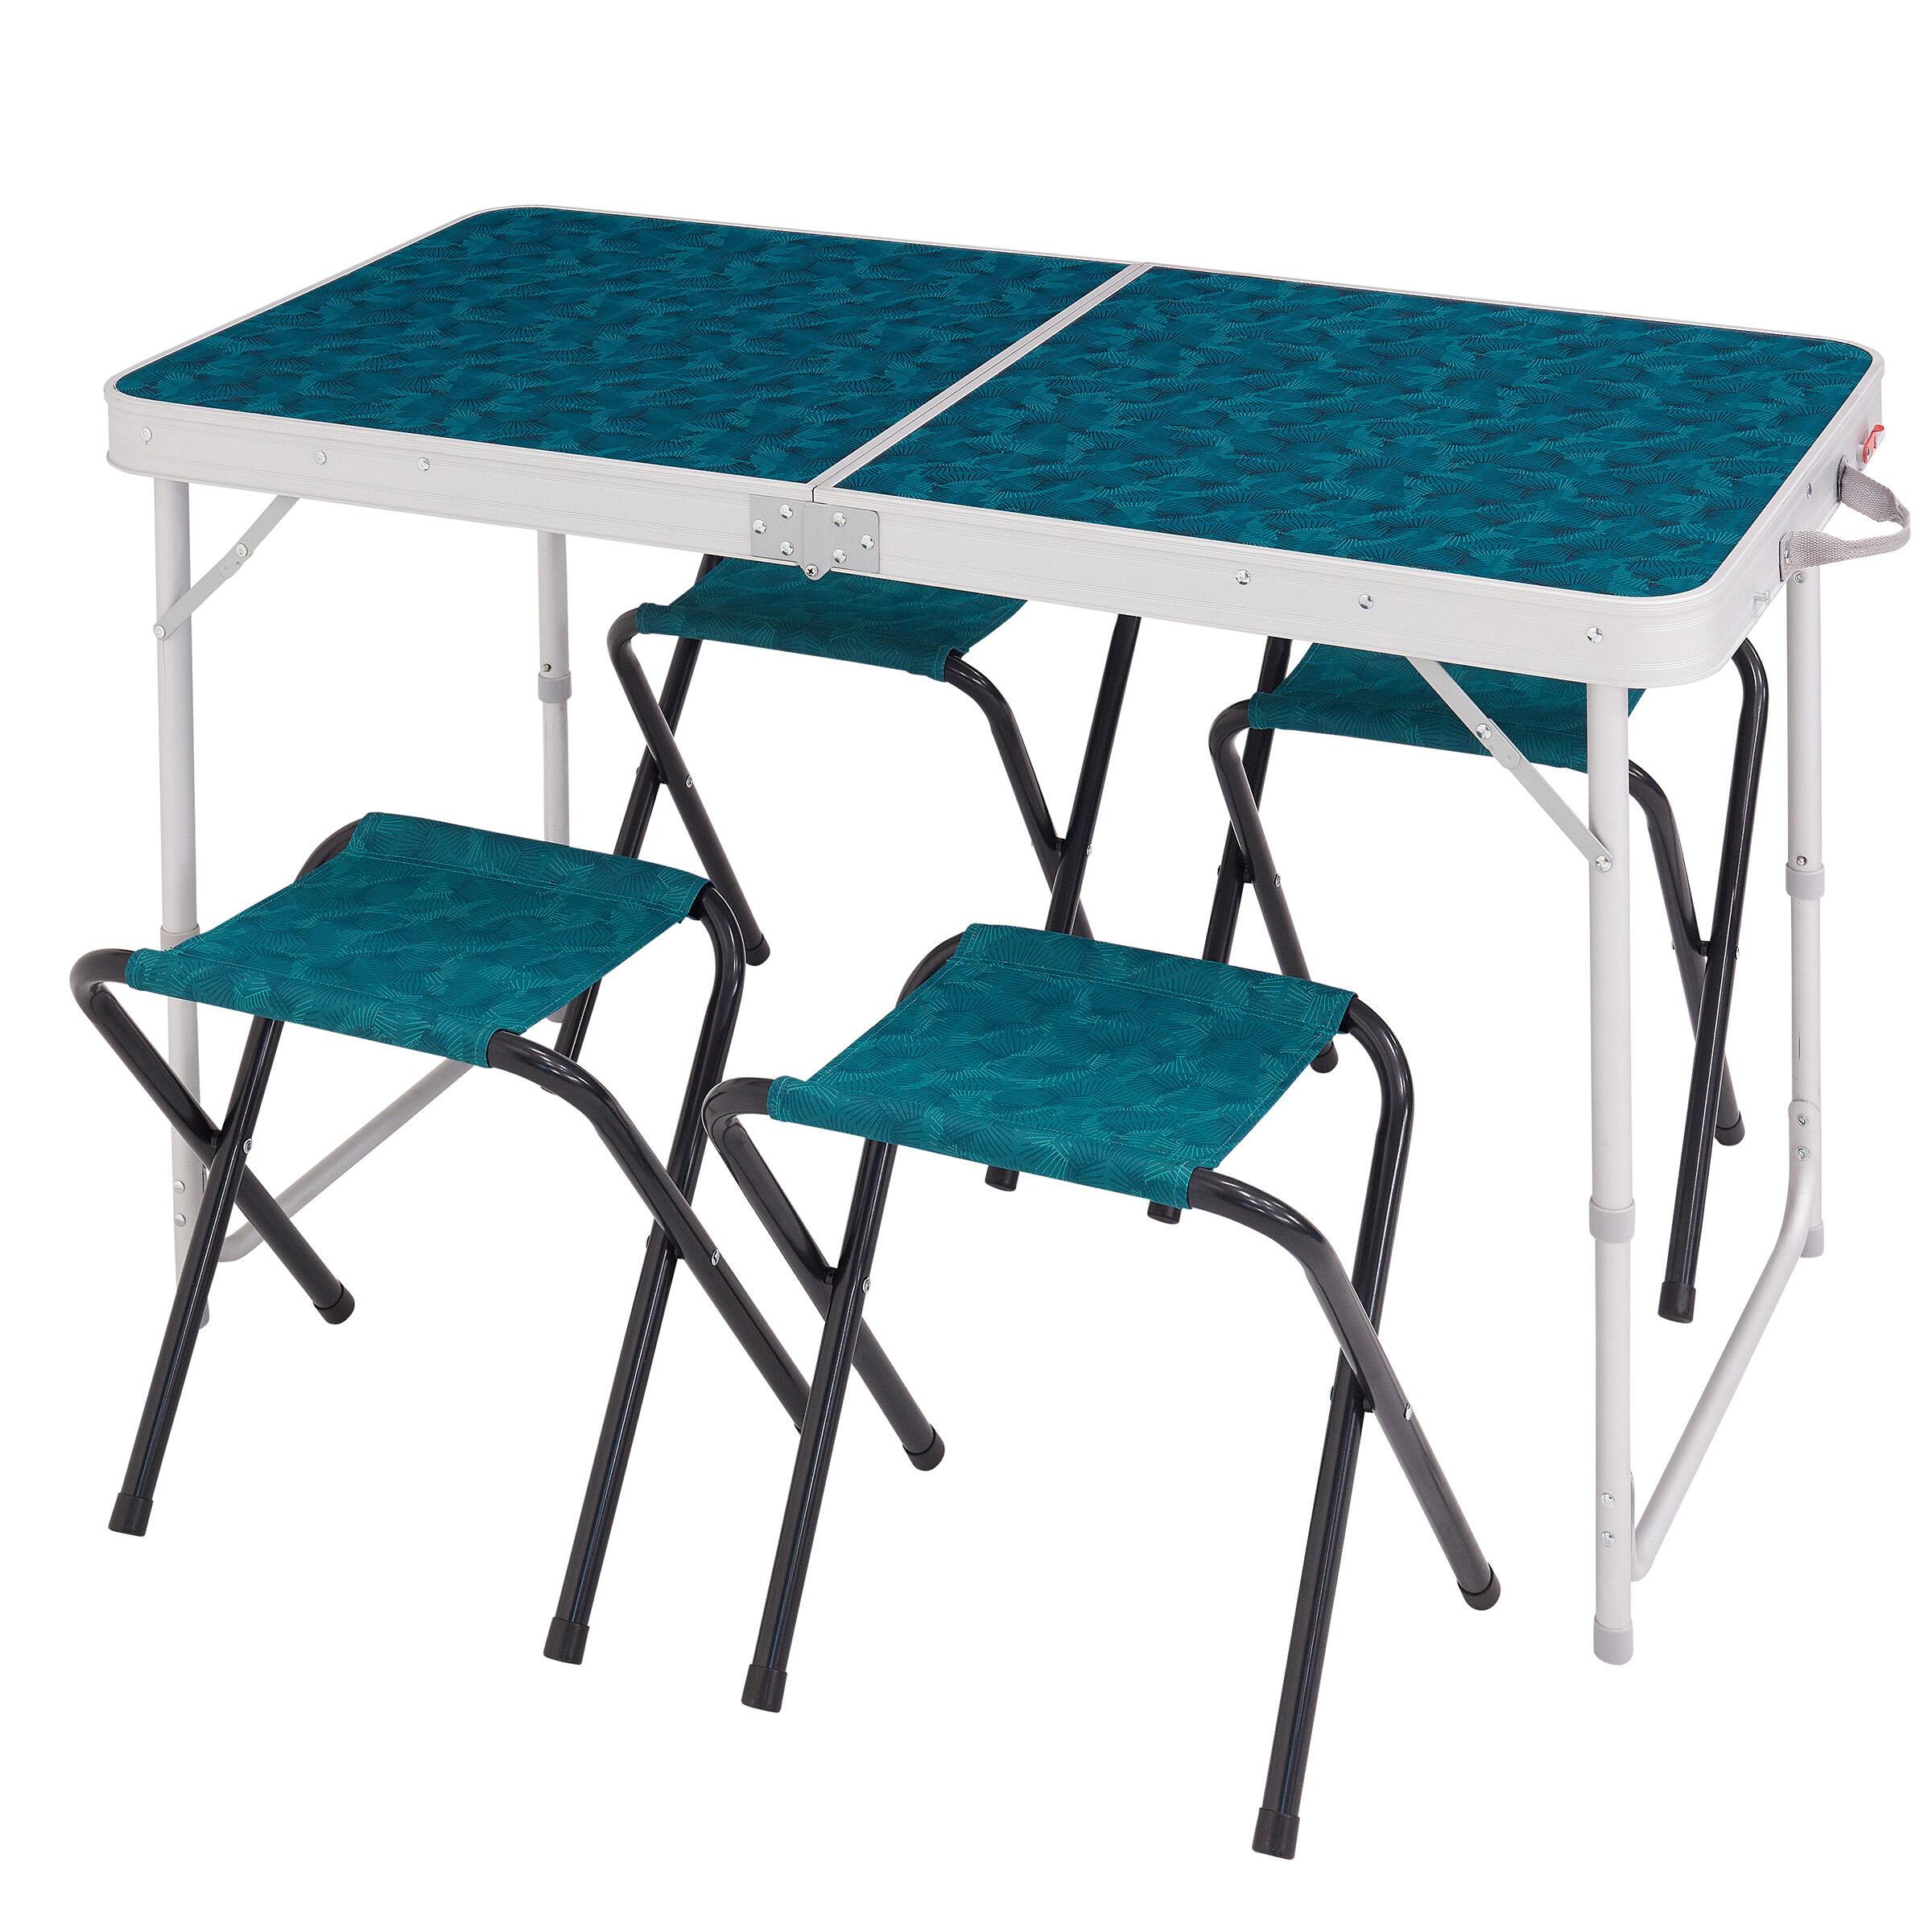 Camping furnitures - Decathlon